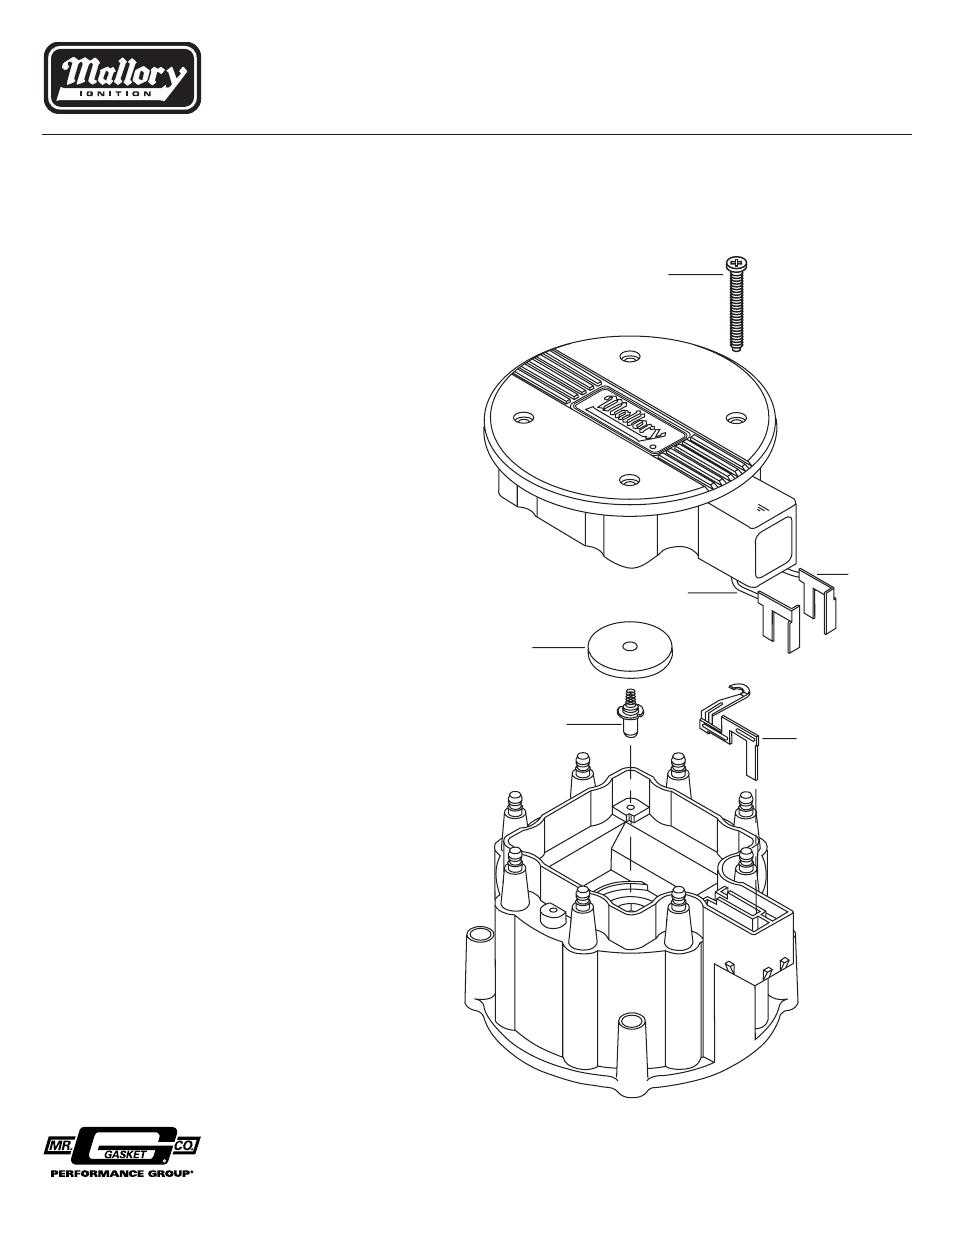 medium resolution of mallory ignition mallory hei performance coil 29212 29215 usermallory ignition mallory hei performance coil 29212 29215 user manual